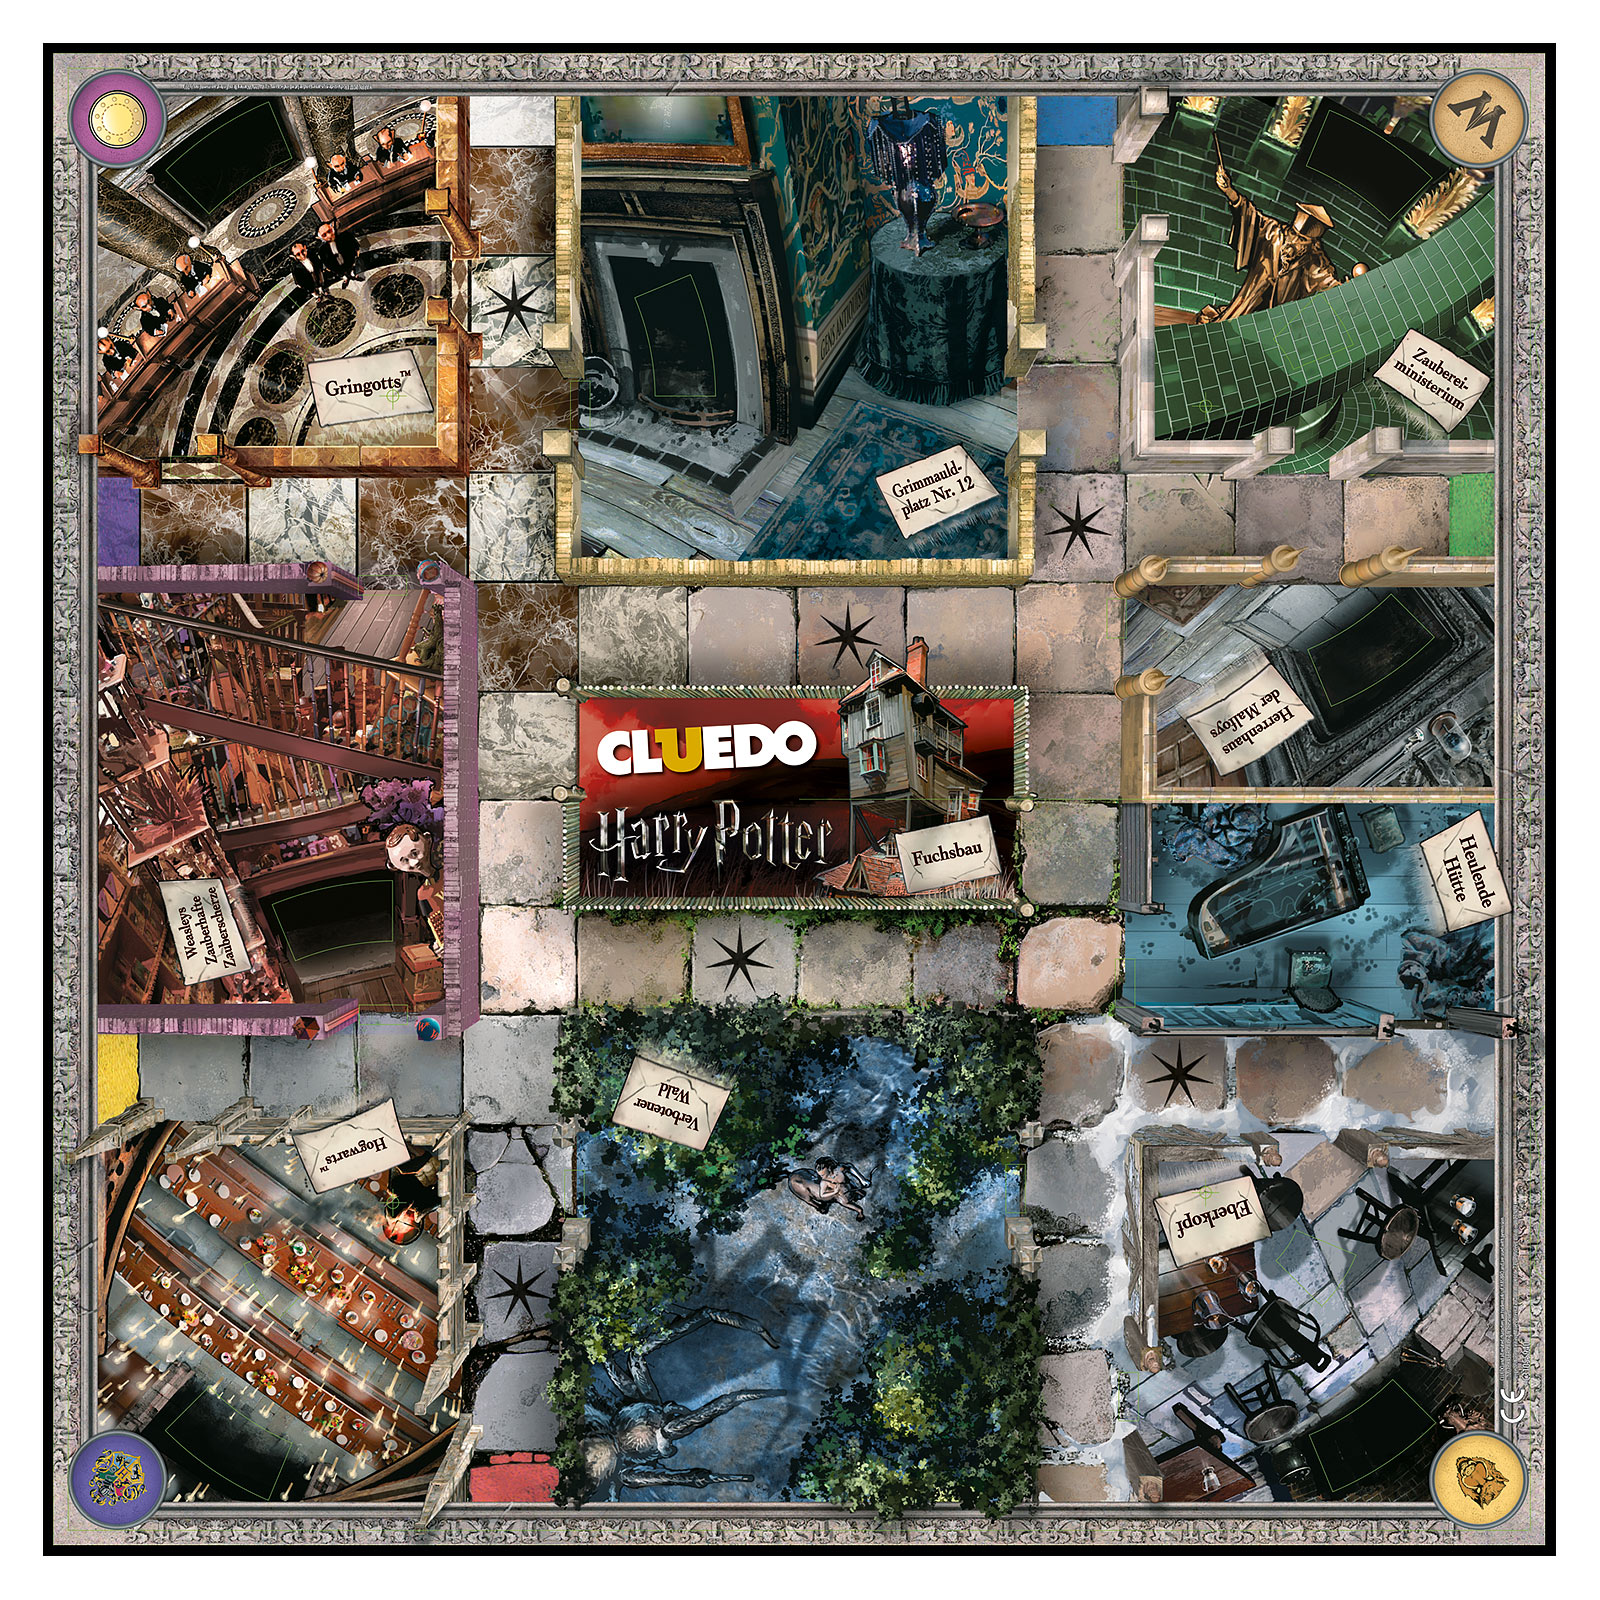 Harry Potter - Cluedo Collectors Edition